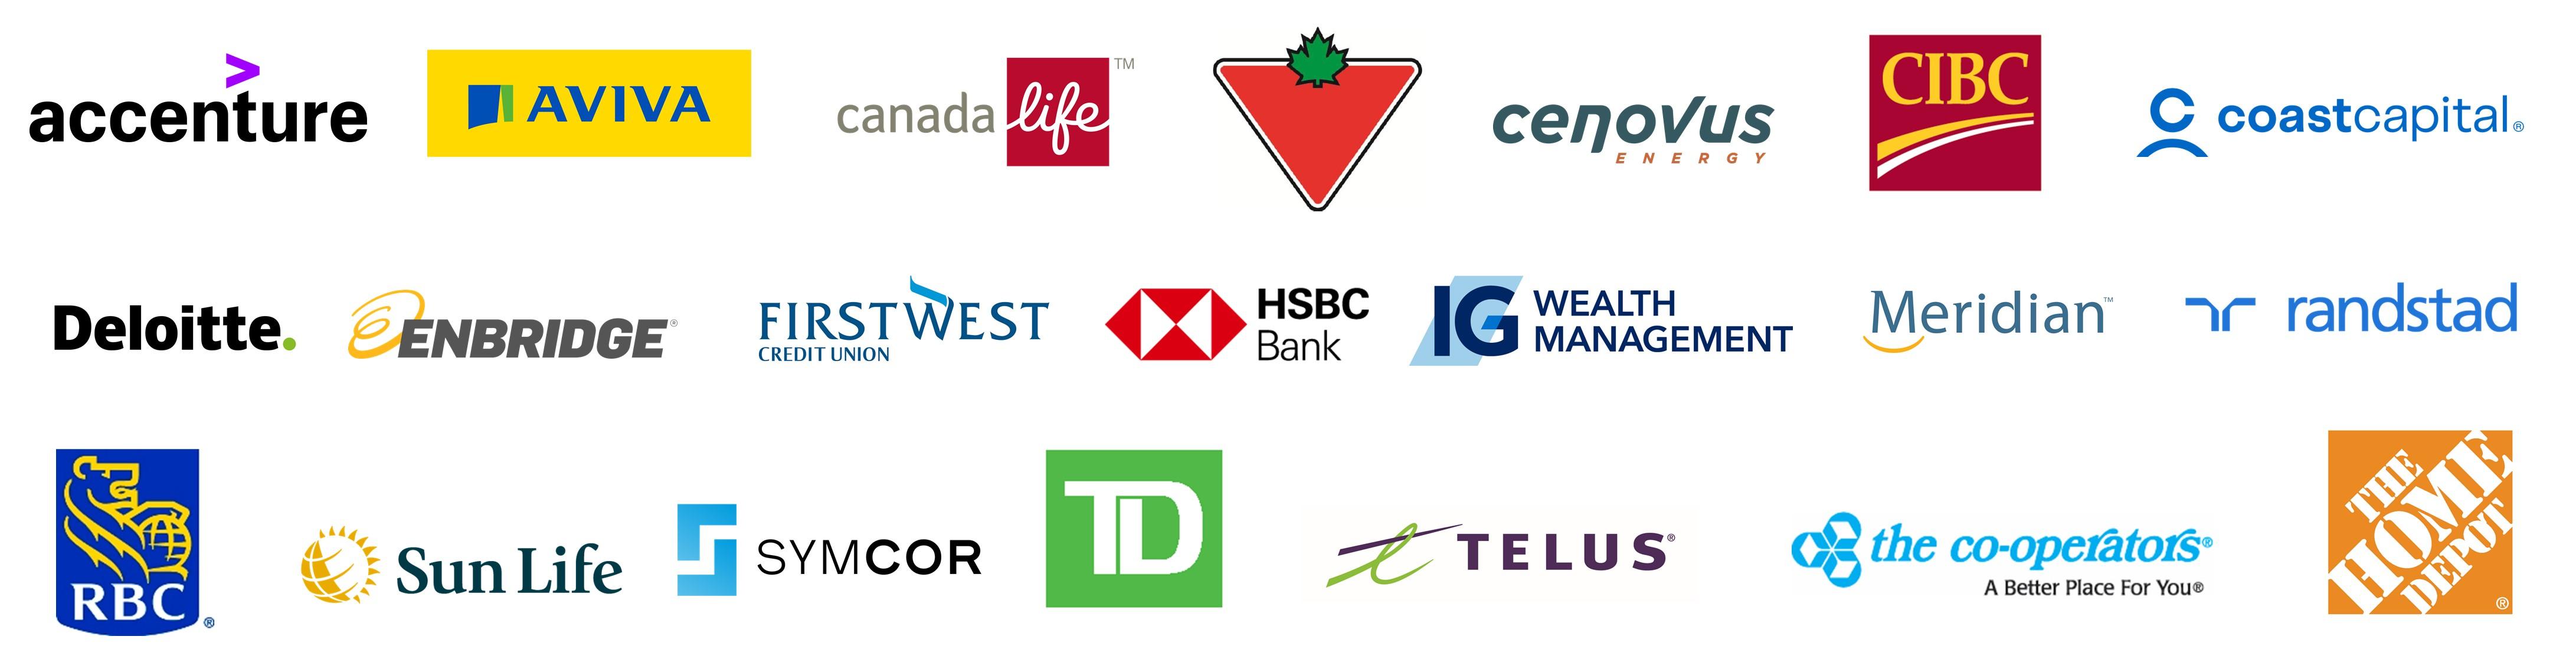 Accenture - Aviva - Canada Life - Canadian Tire - Cenovus Energy CIBC - Coast Capital - Deloitte - Enbridge - First West Credit Union HSBC Bank - IG Wealth Management- Meridian - Randstad - RBC Sun Life- Symcor - TD- Telus - The Co-operators- The Home Depot